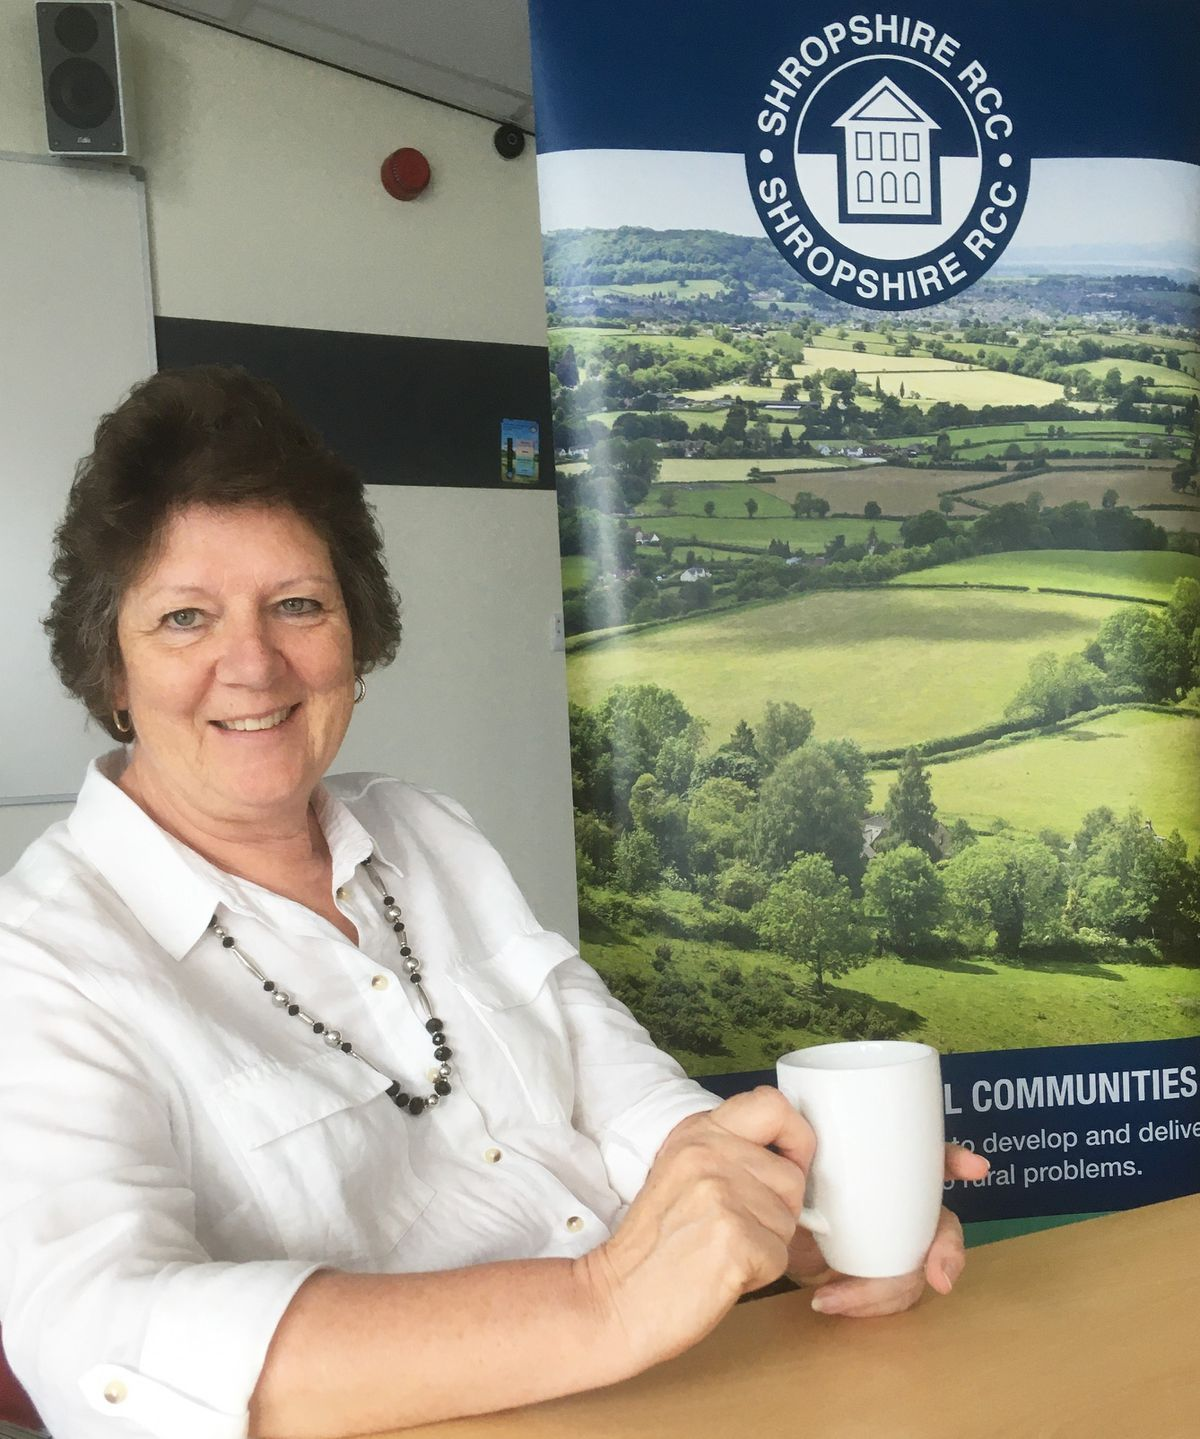 Chief executive of Shropshire Rural Communities Charity Julia Baron